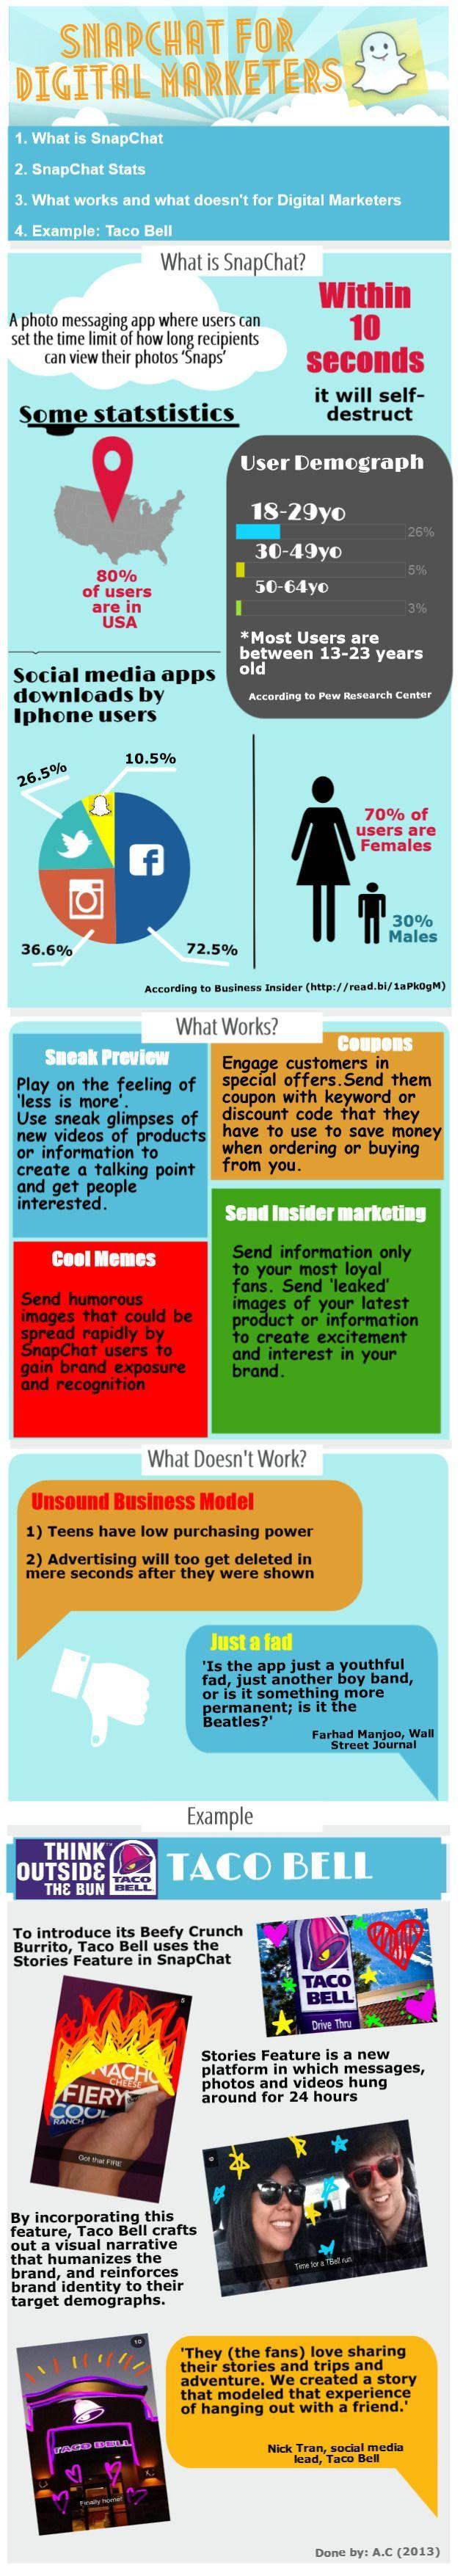 #snapchat For #digitalmarketers